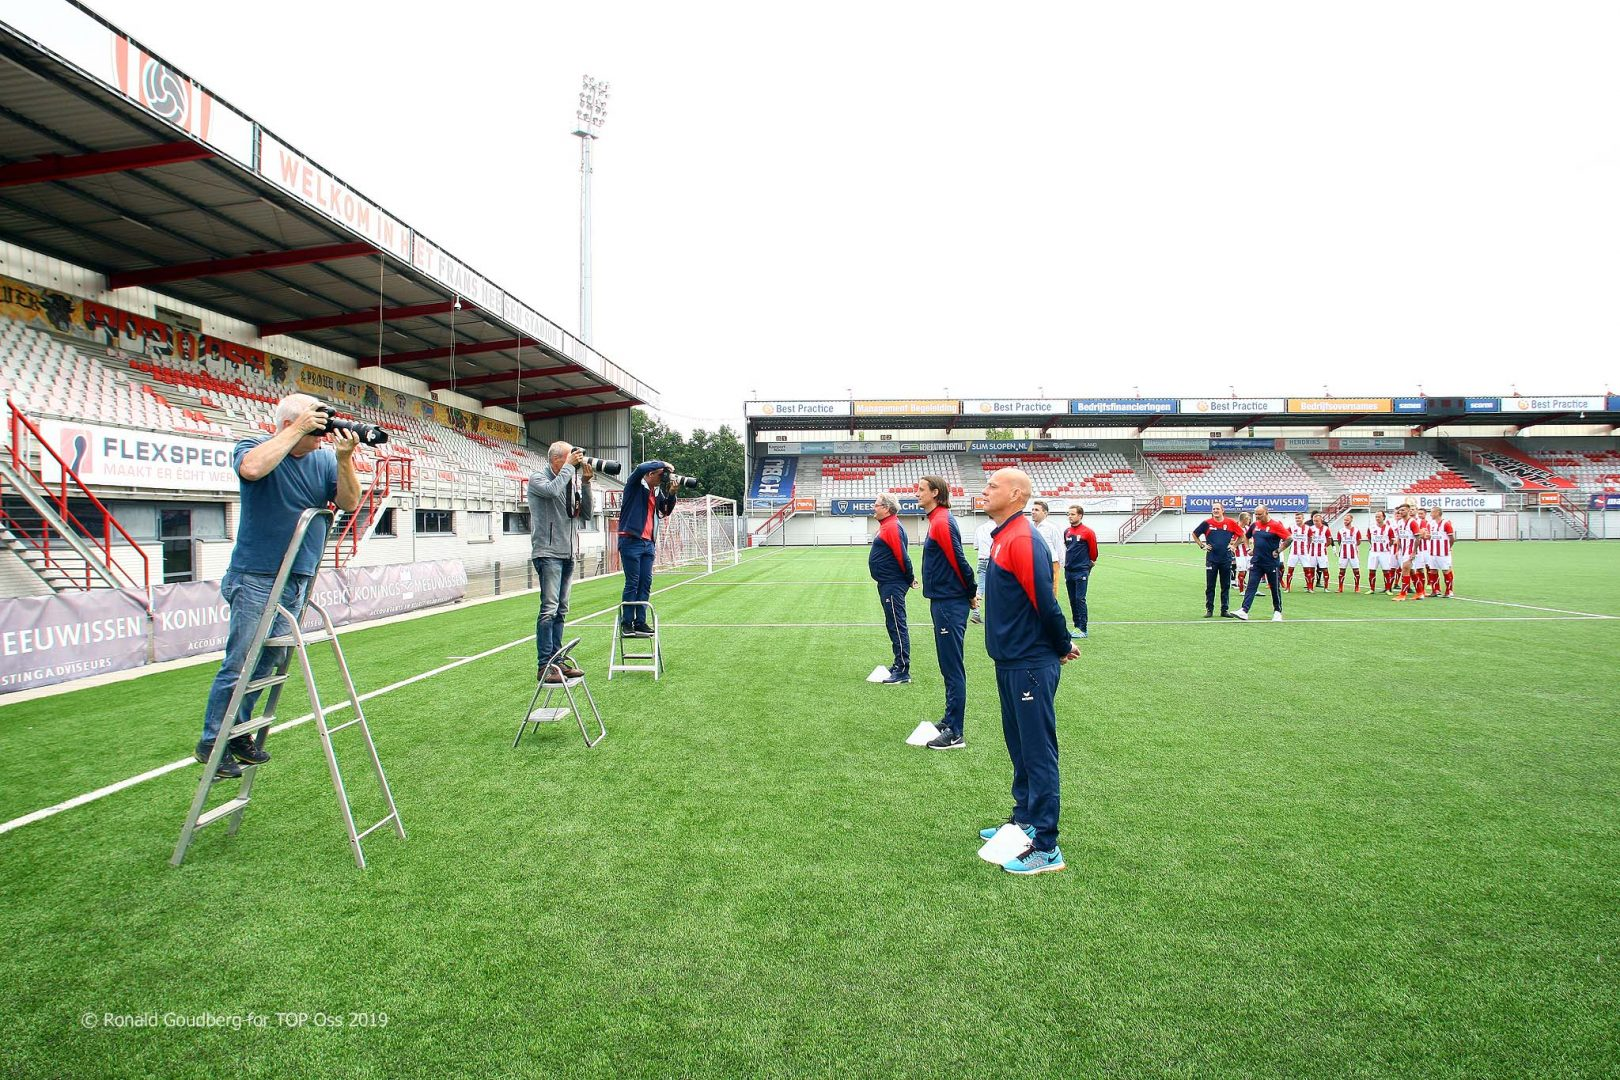 Pieter Tuns wordt assistent bij TOP Oss